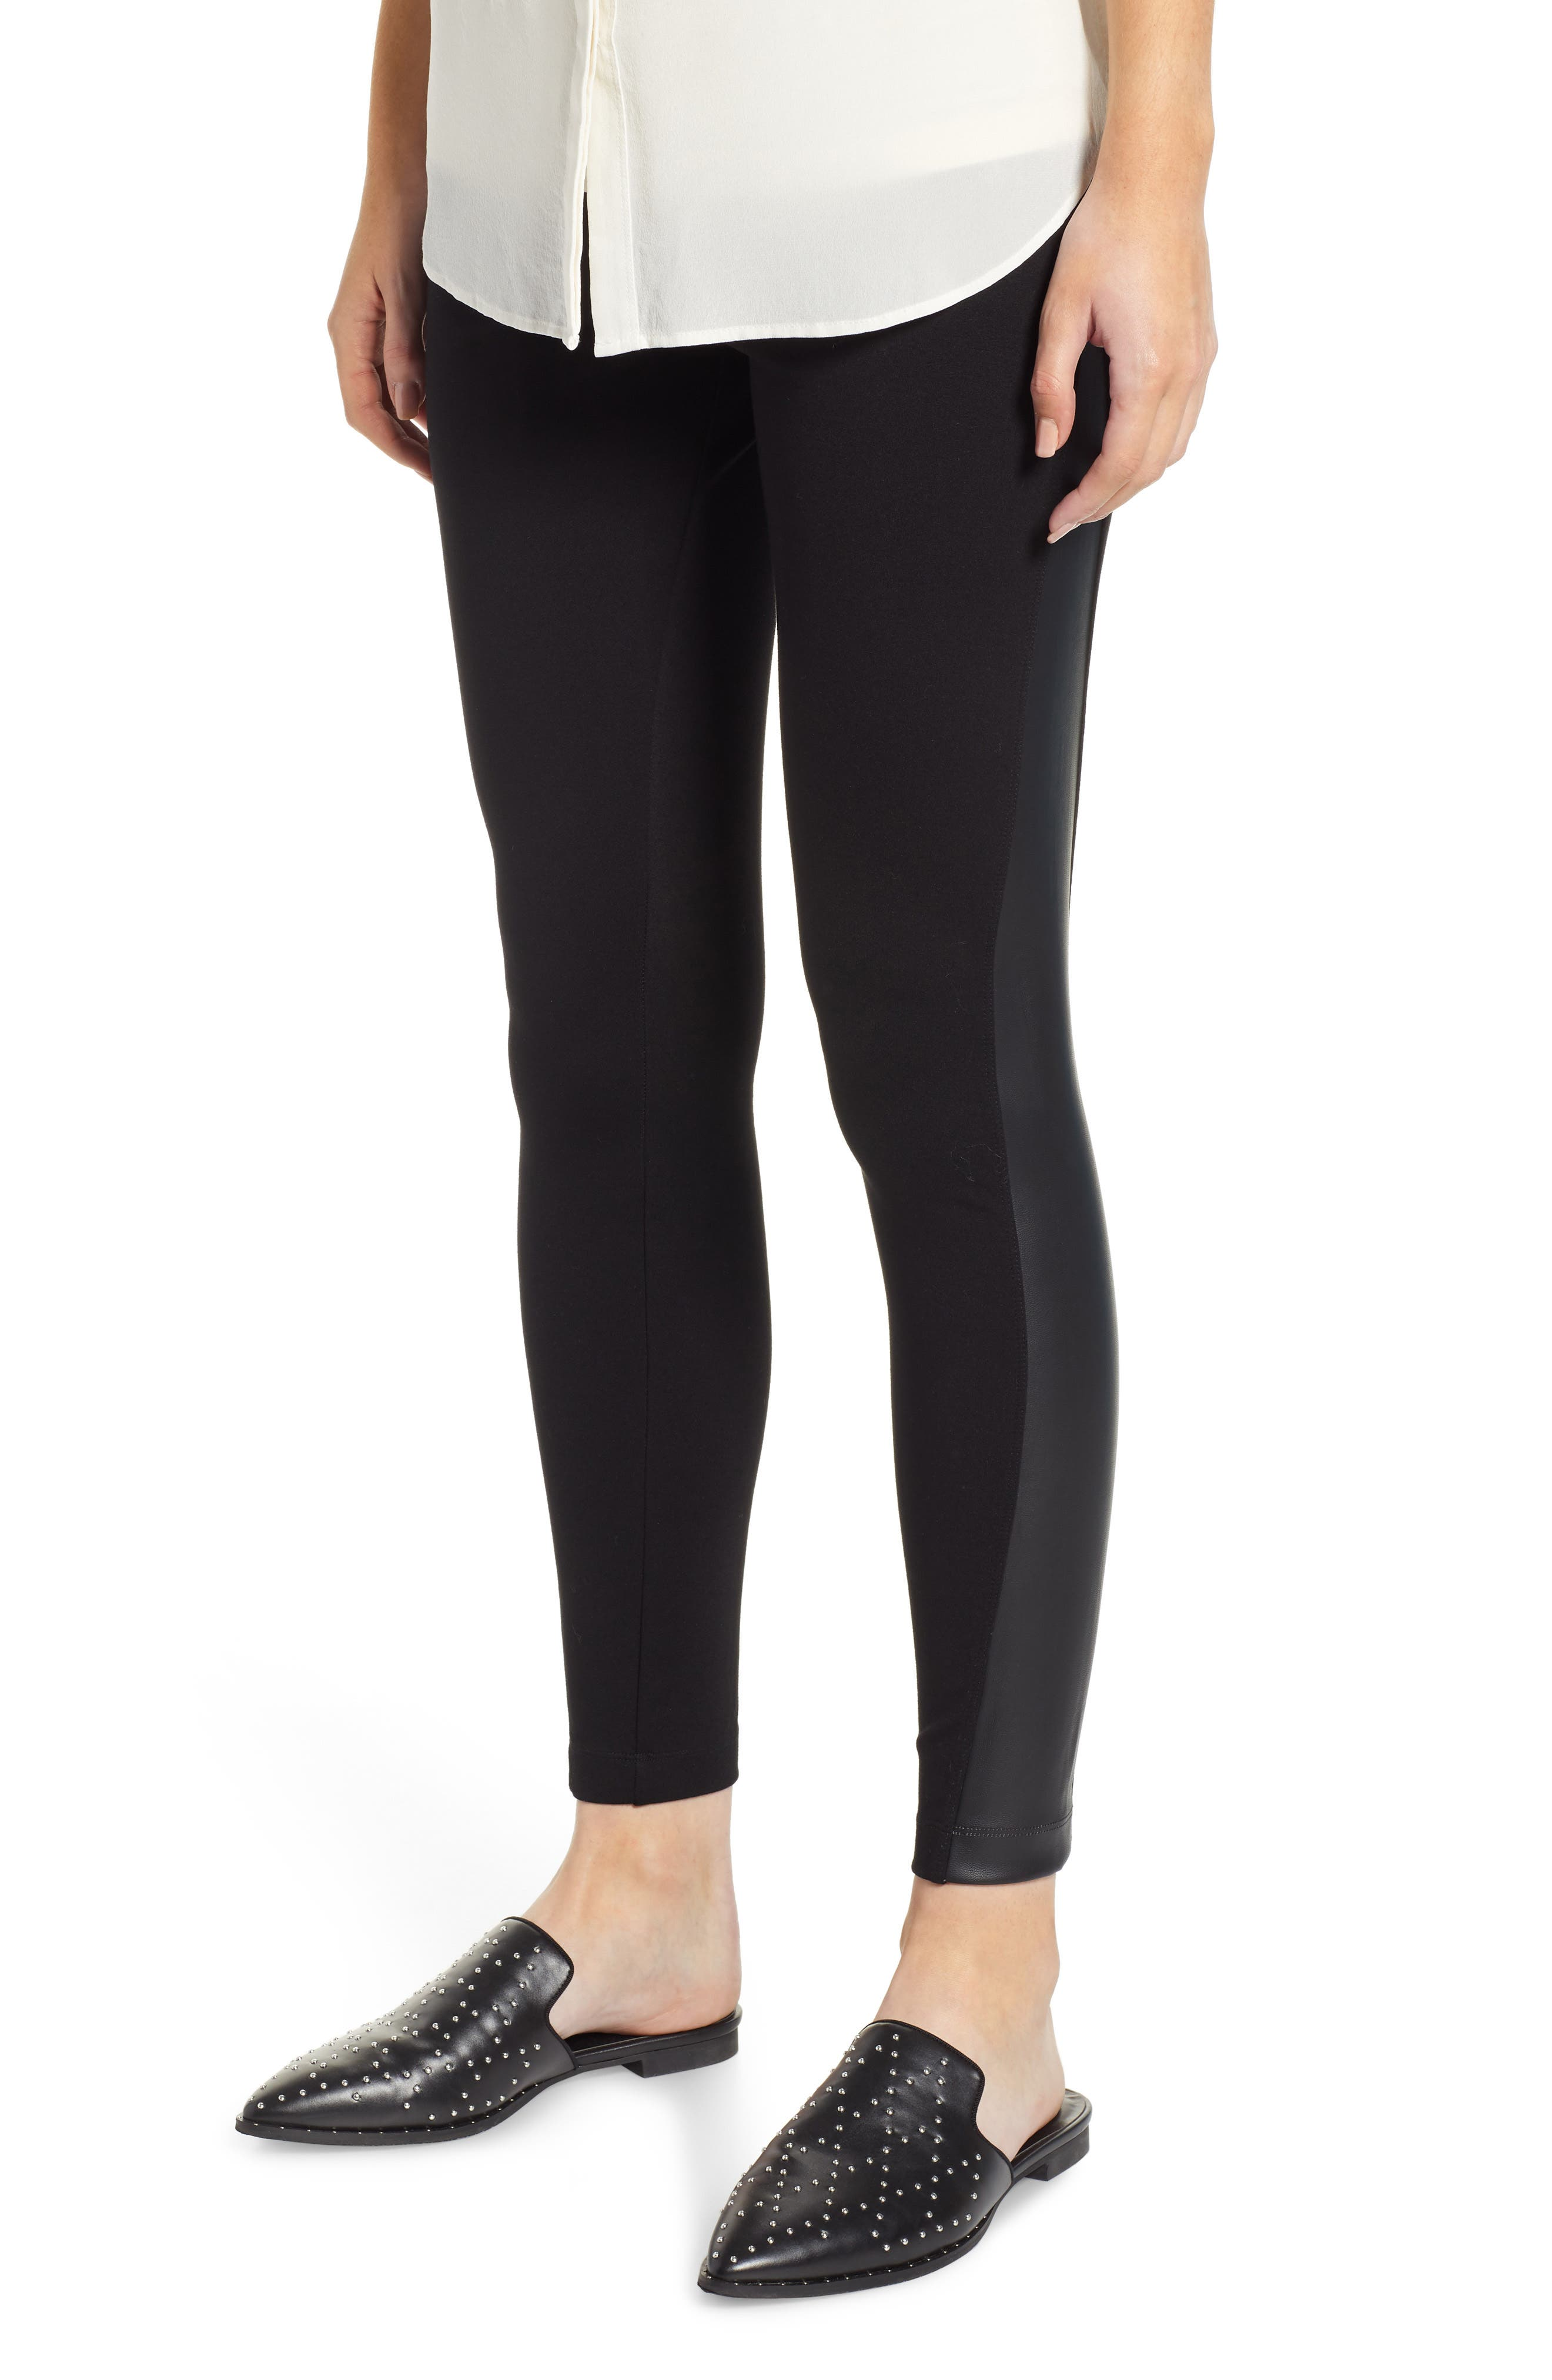 Lysse Gemma Faux-Leather Panel Ankle Leggings, Black